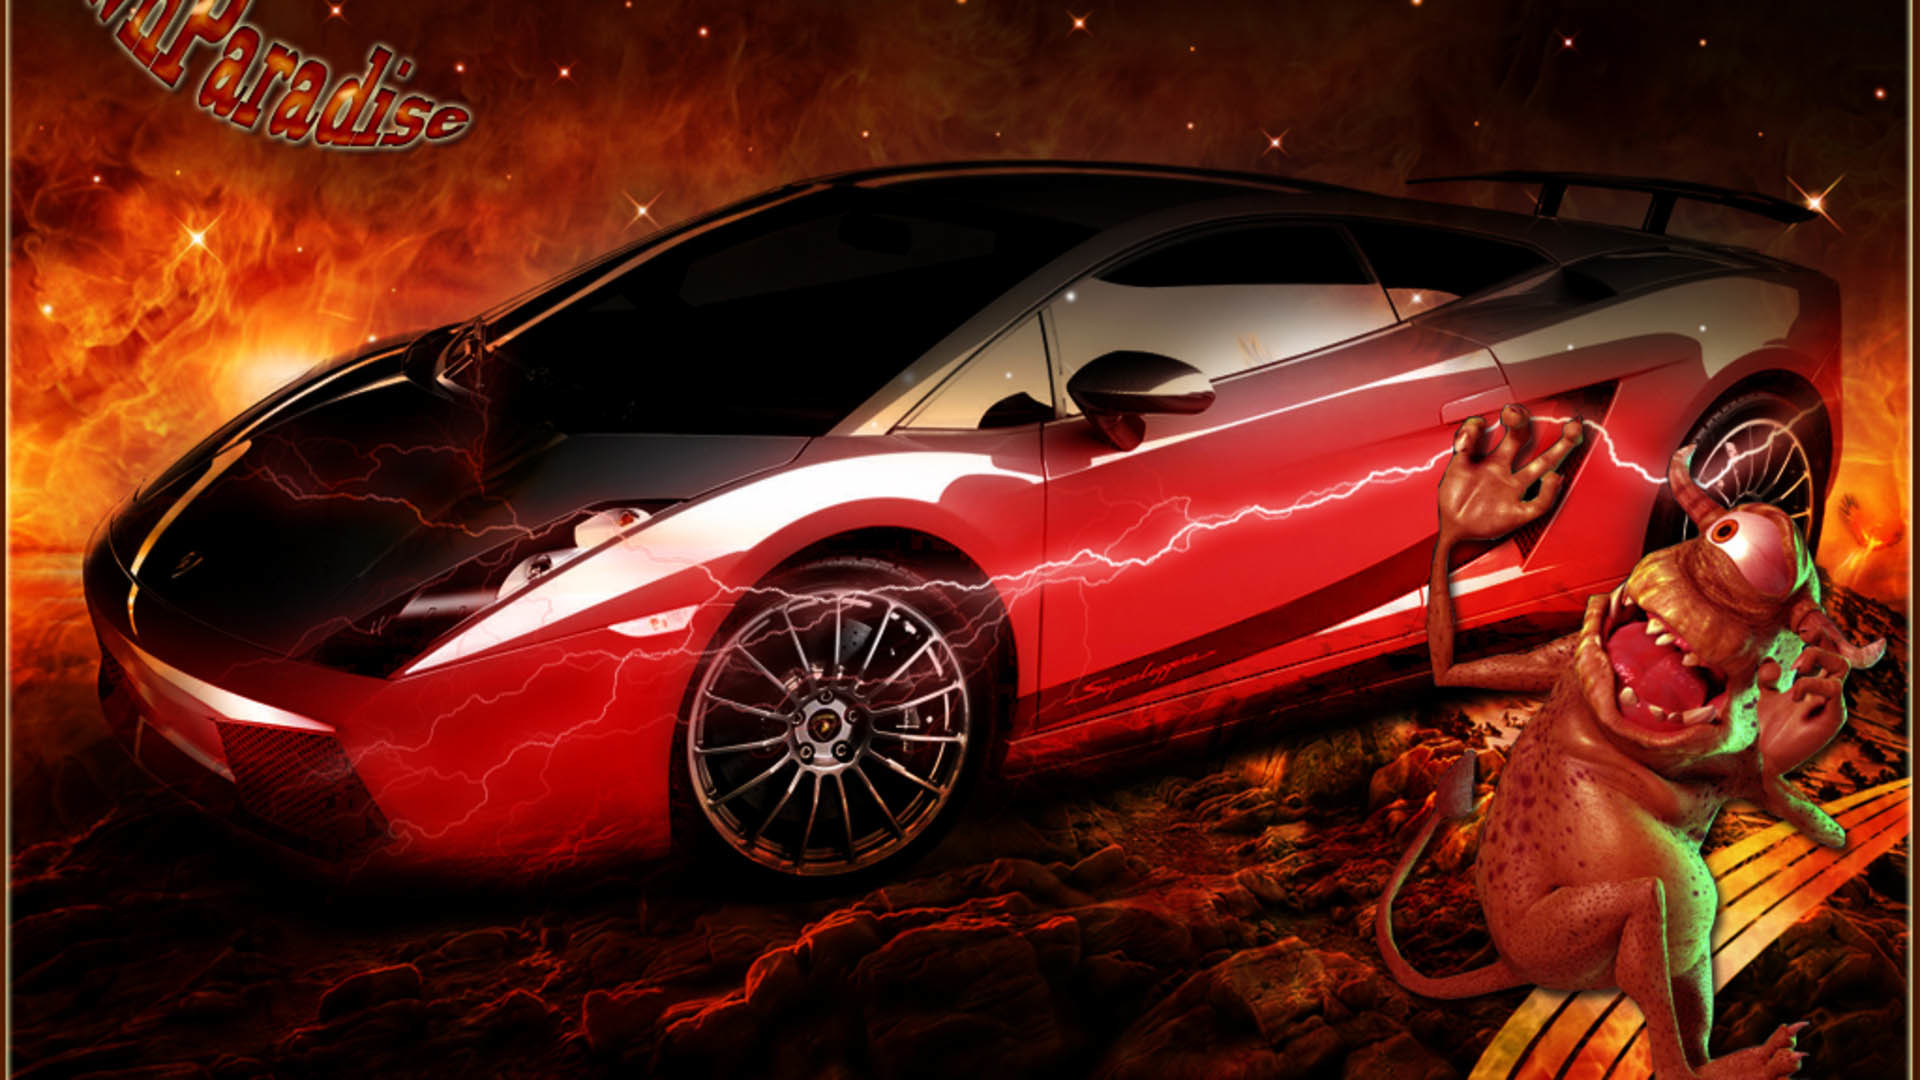 Cool Red Lamborghini Wallpapers. Home > Galleries > Top 10 Lamborghini  Wallpapers